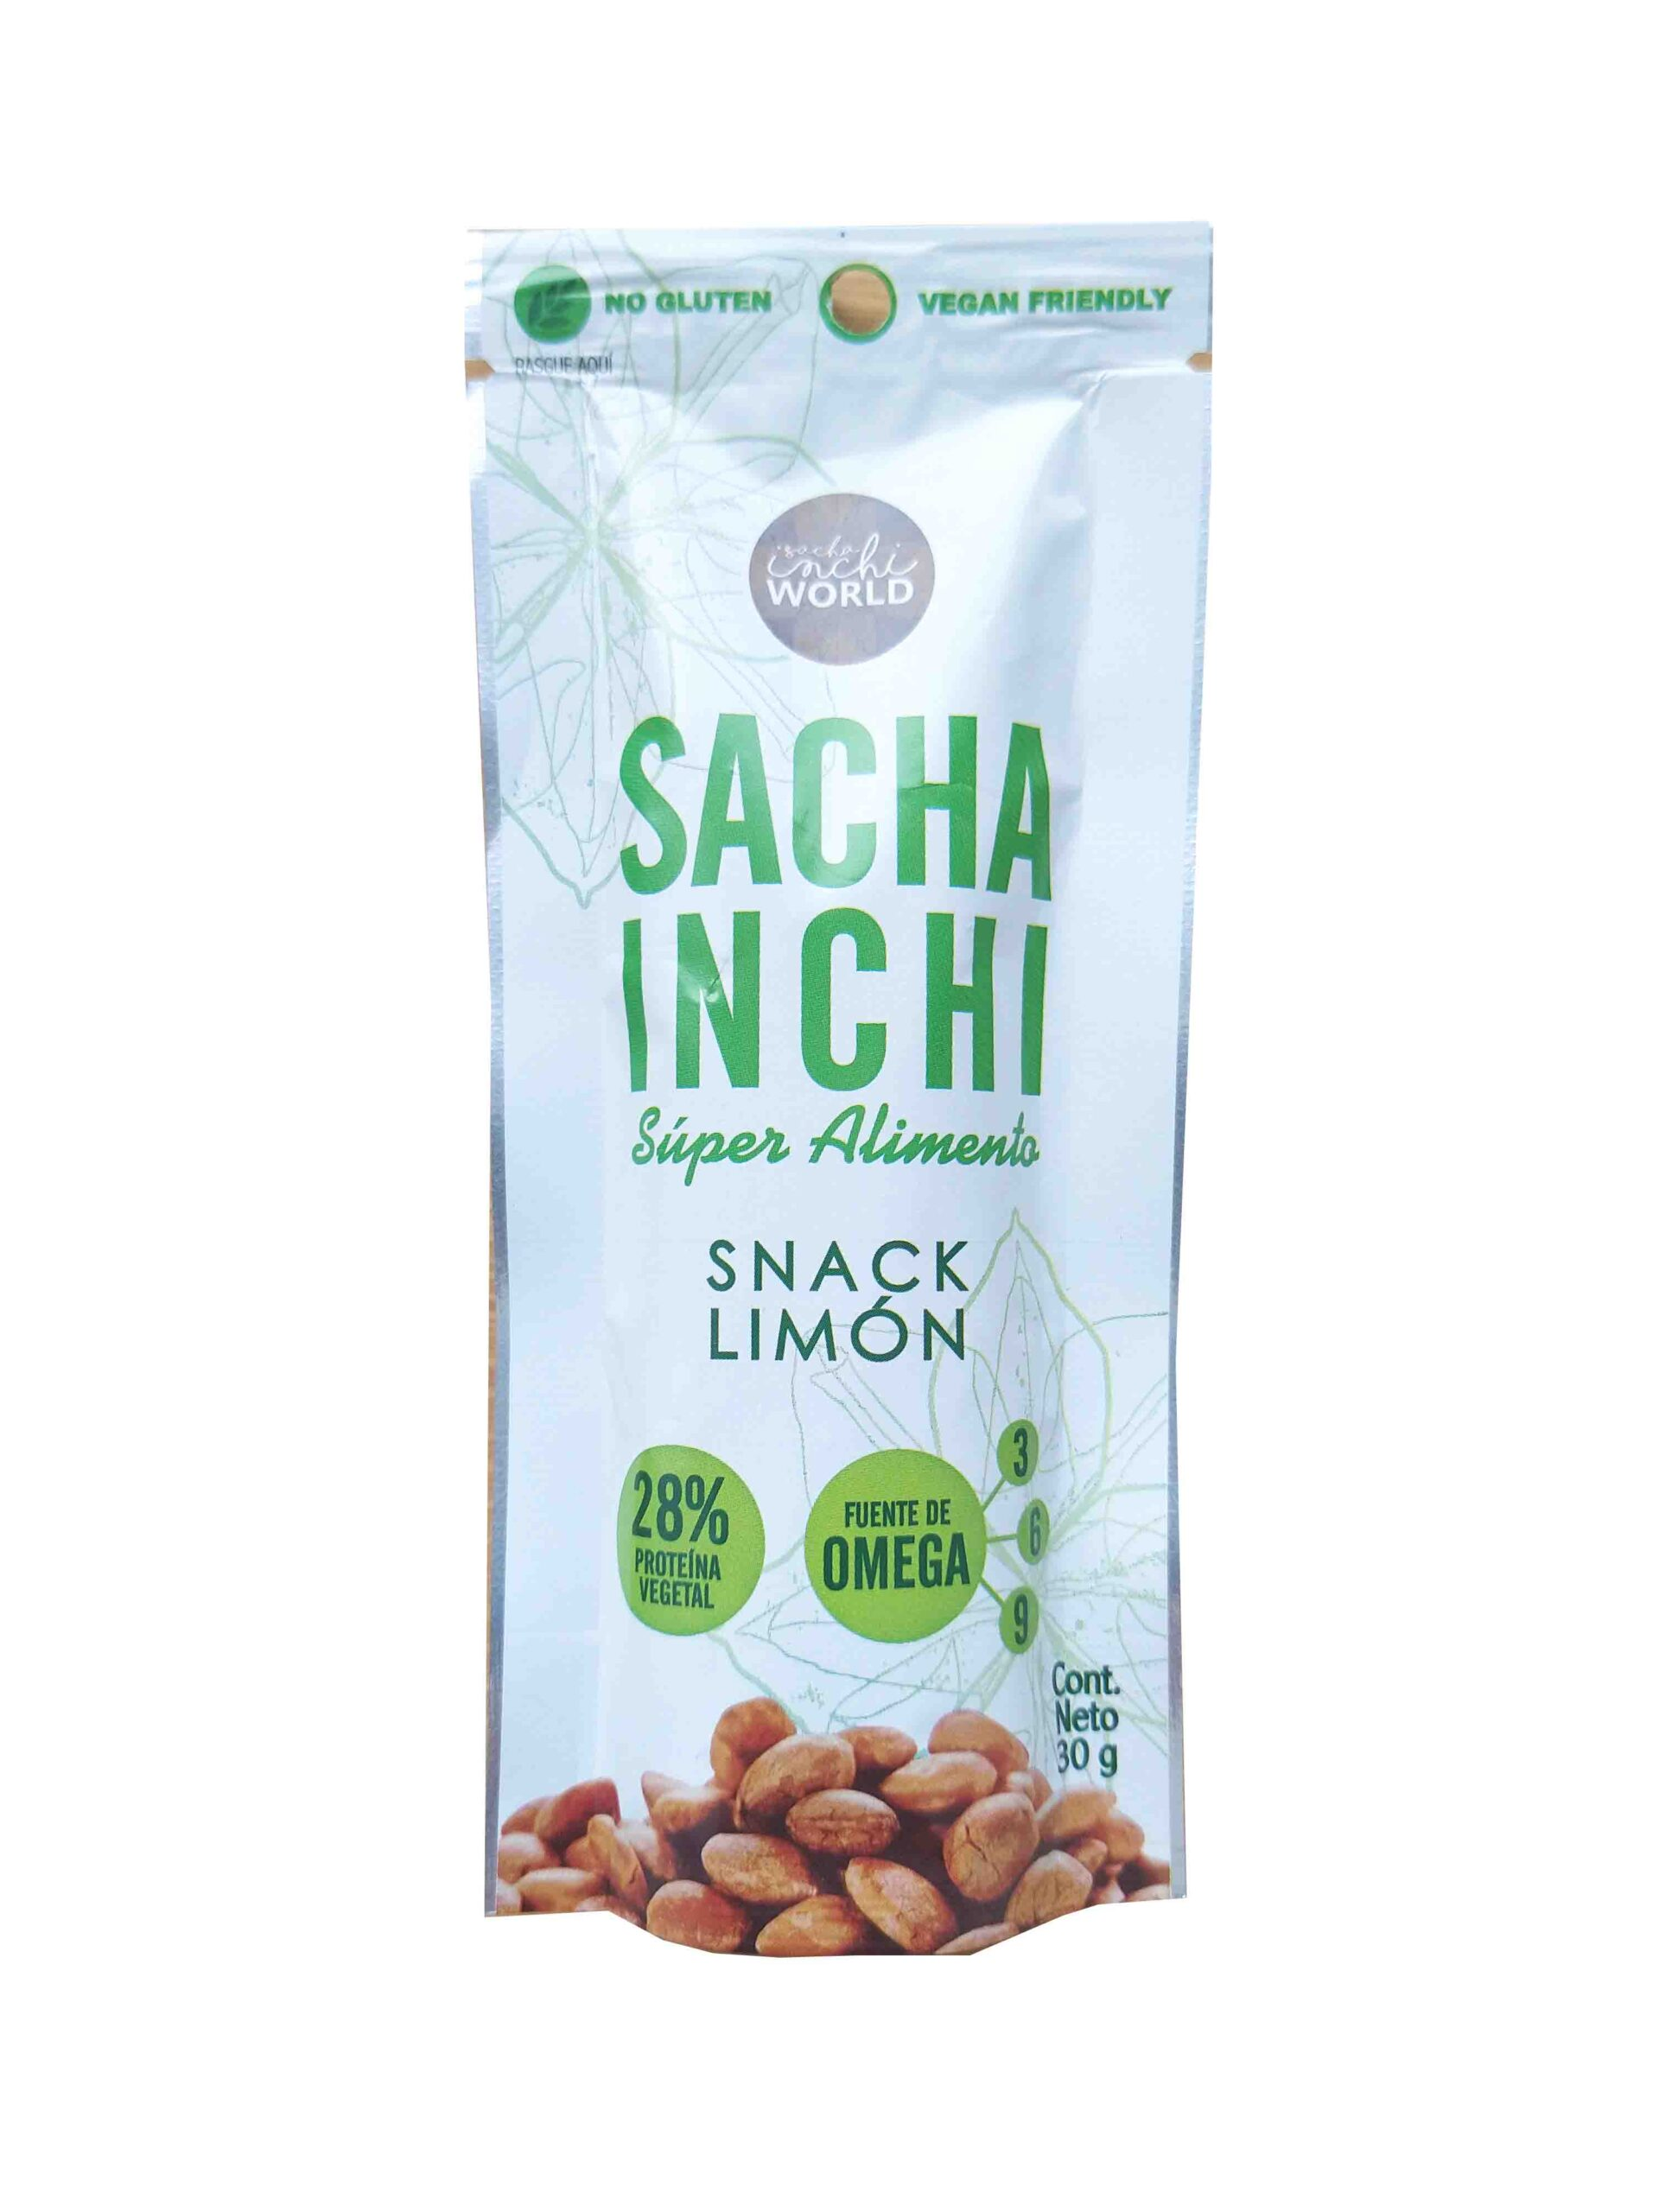 Snack de Sacha inchi Limón 30g InchiWorld